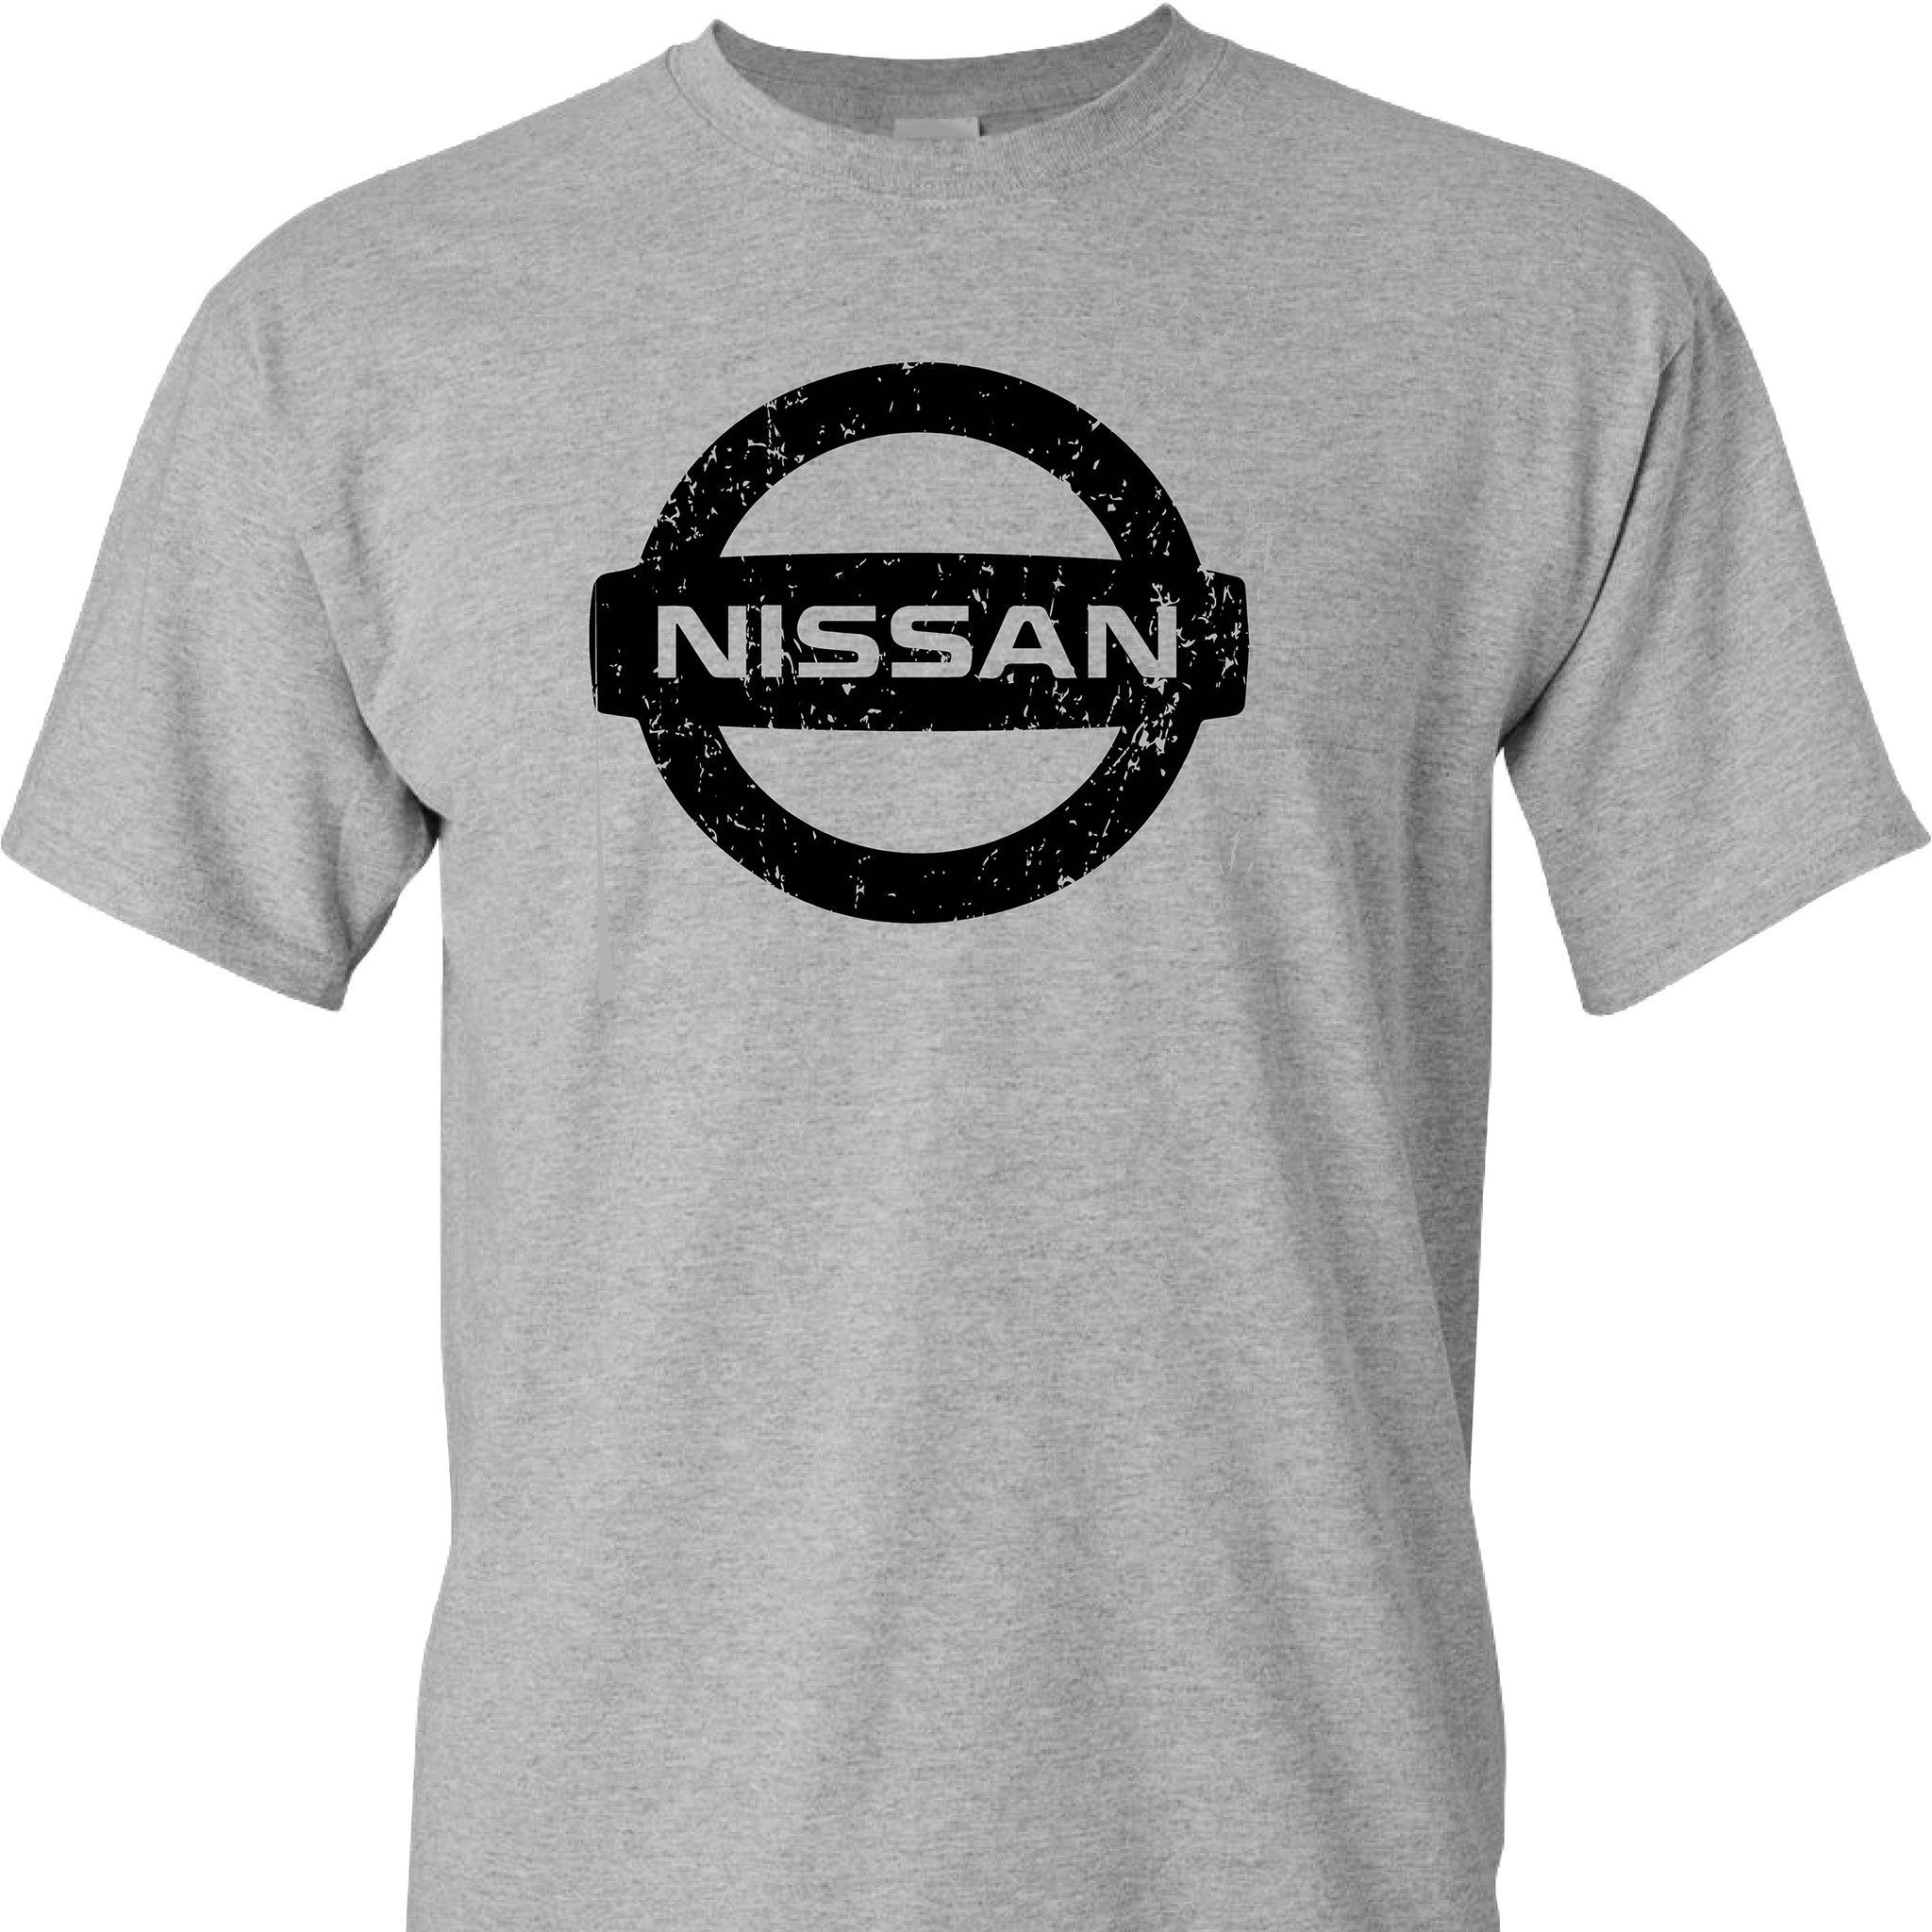 photo shirts race shirt custom ideas tags mercedes photos company run benz design img t corporate